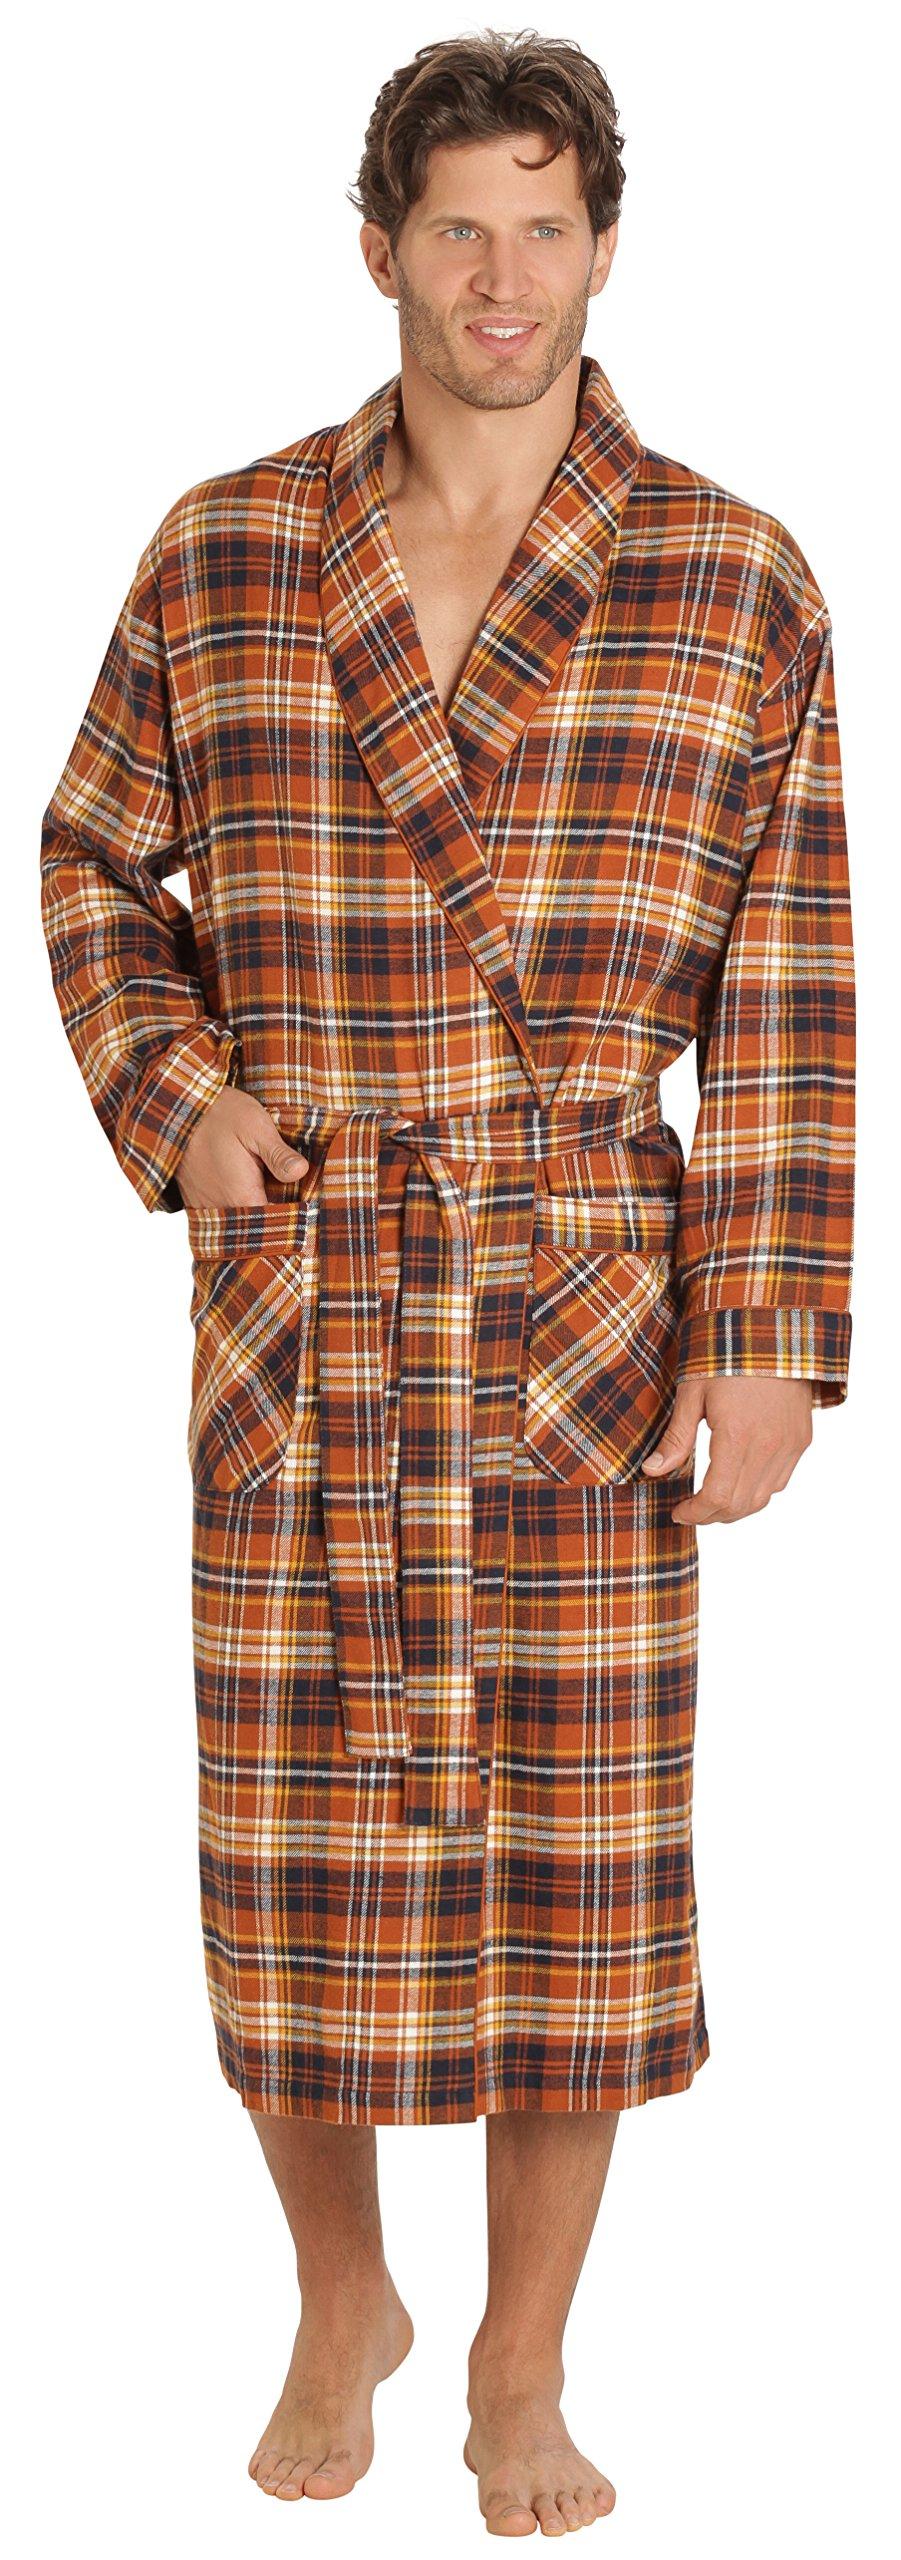 EVERDREAM Mens Flannel Robe, Shawl Collar Lightweight 100% Cotton Bathrobe, Size XX-Large/XXX-Large Brown Rust